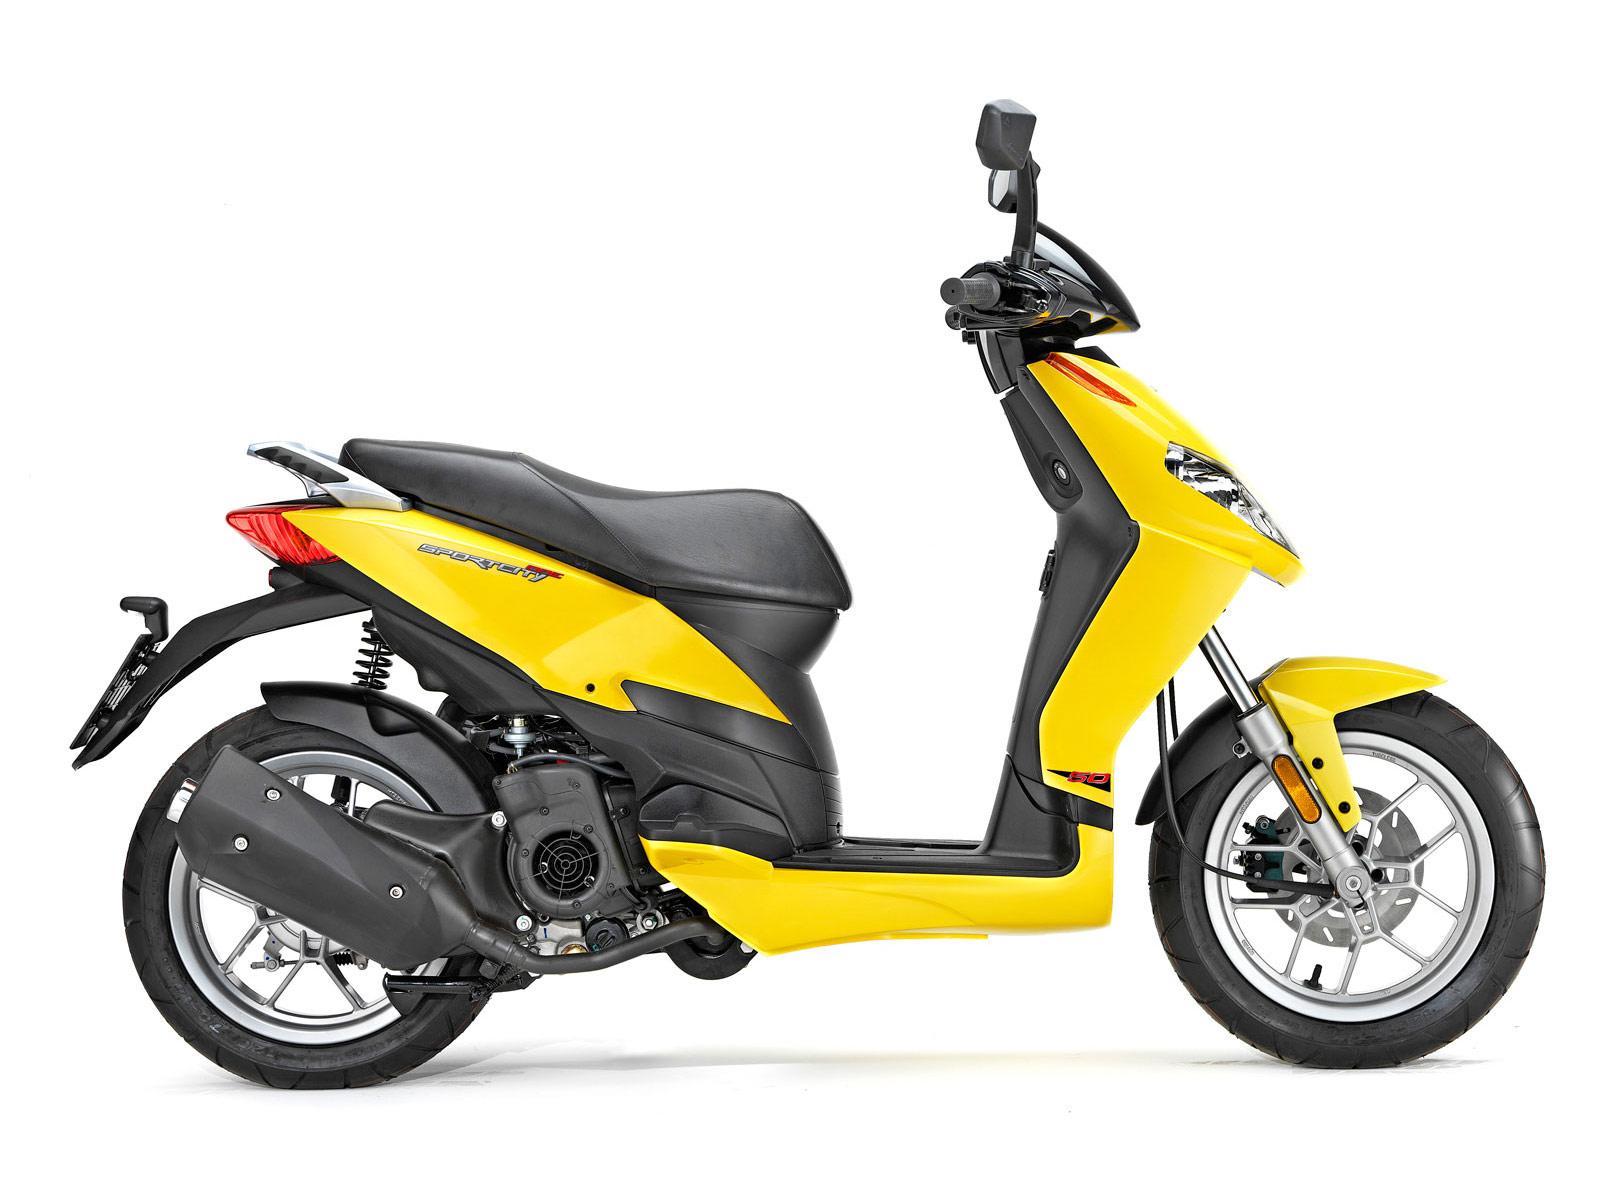 2011 aprilia sportcity 50 scooter pictures. Black Bedroom Furniture Sets. Home Design Ideas